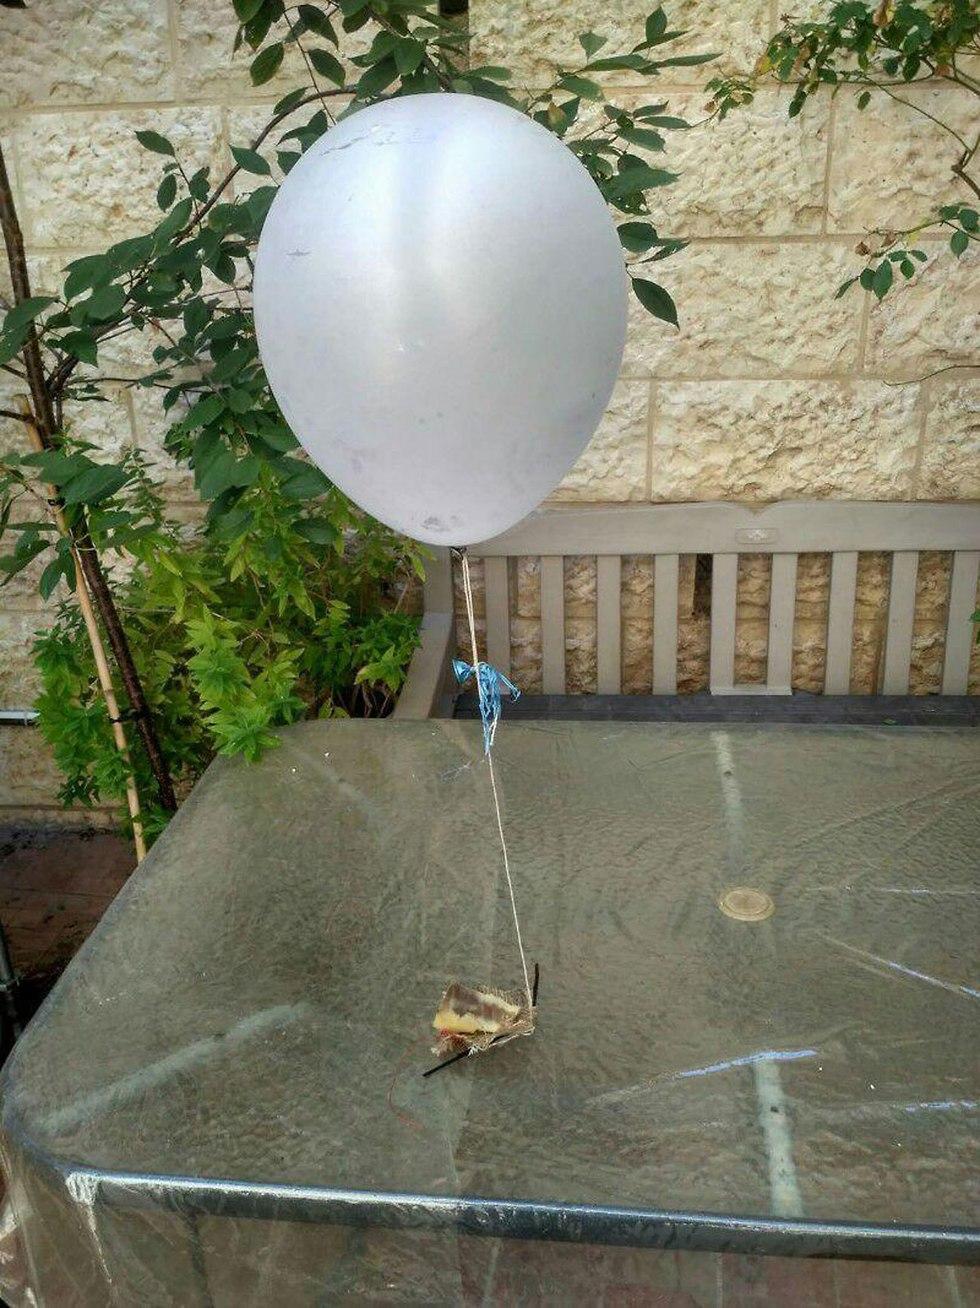 Incendiary balloon lands in backyard